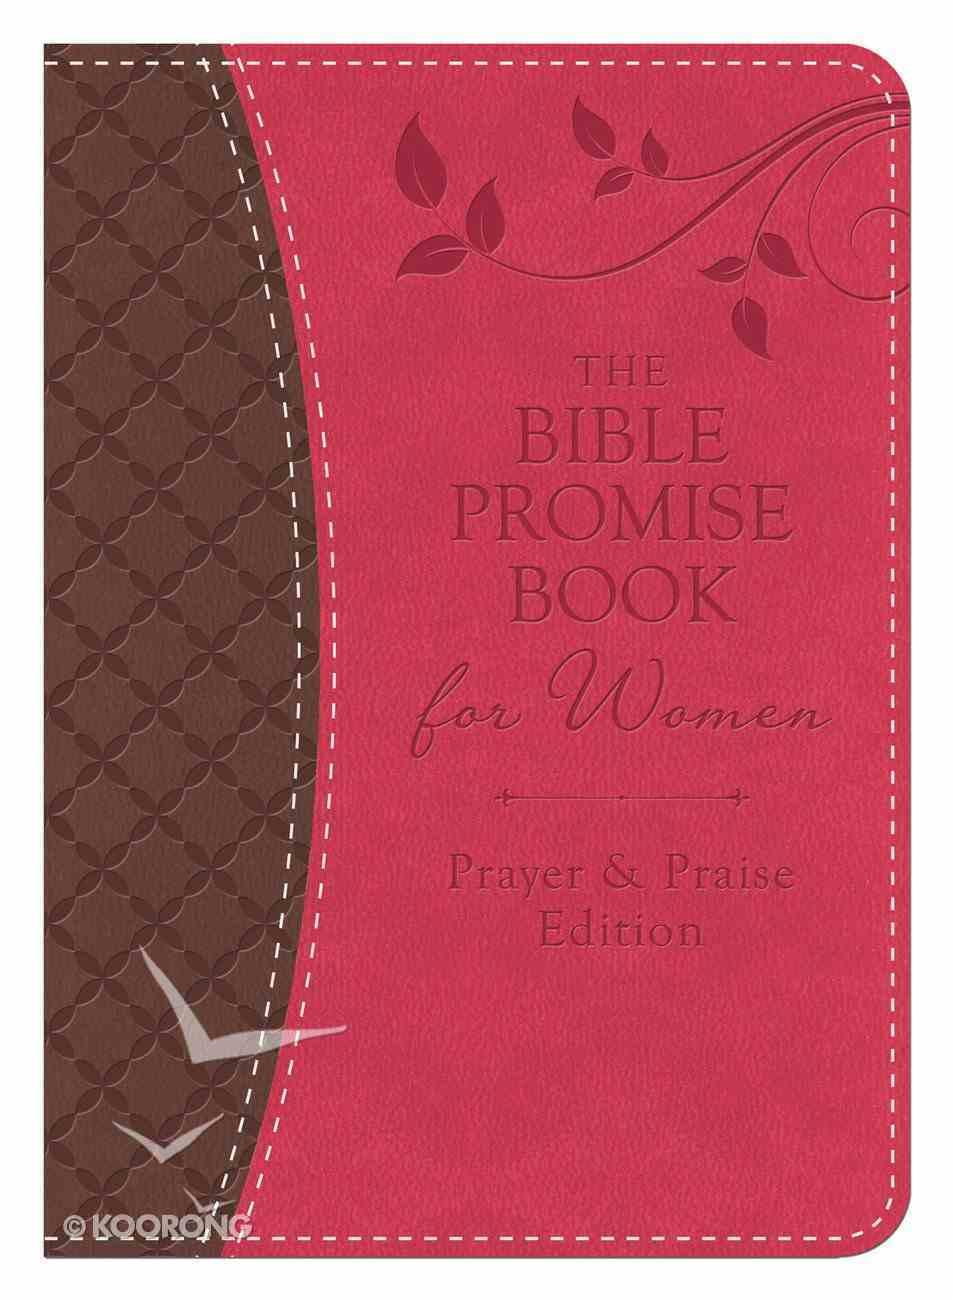 The Bible Promise Book For Women - Prayer & Praise Edition eBook